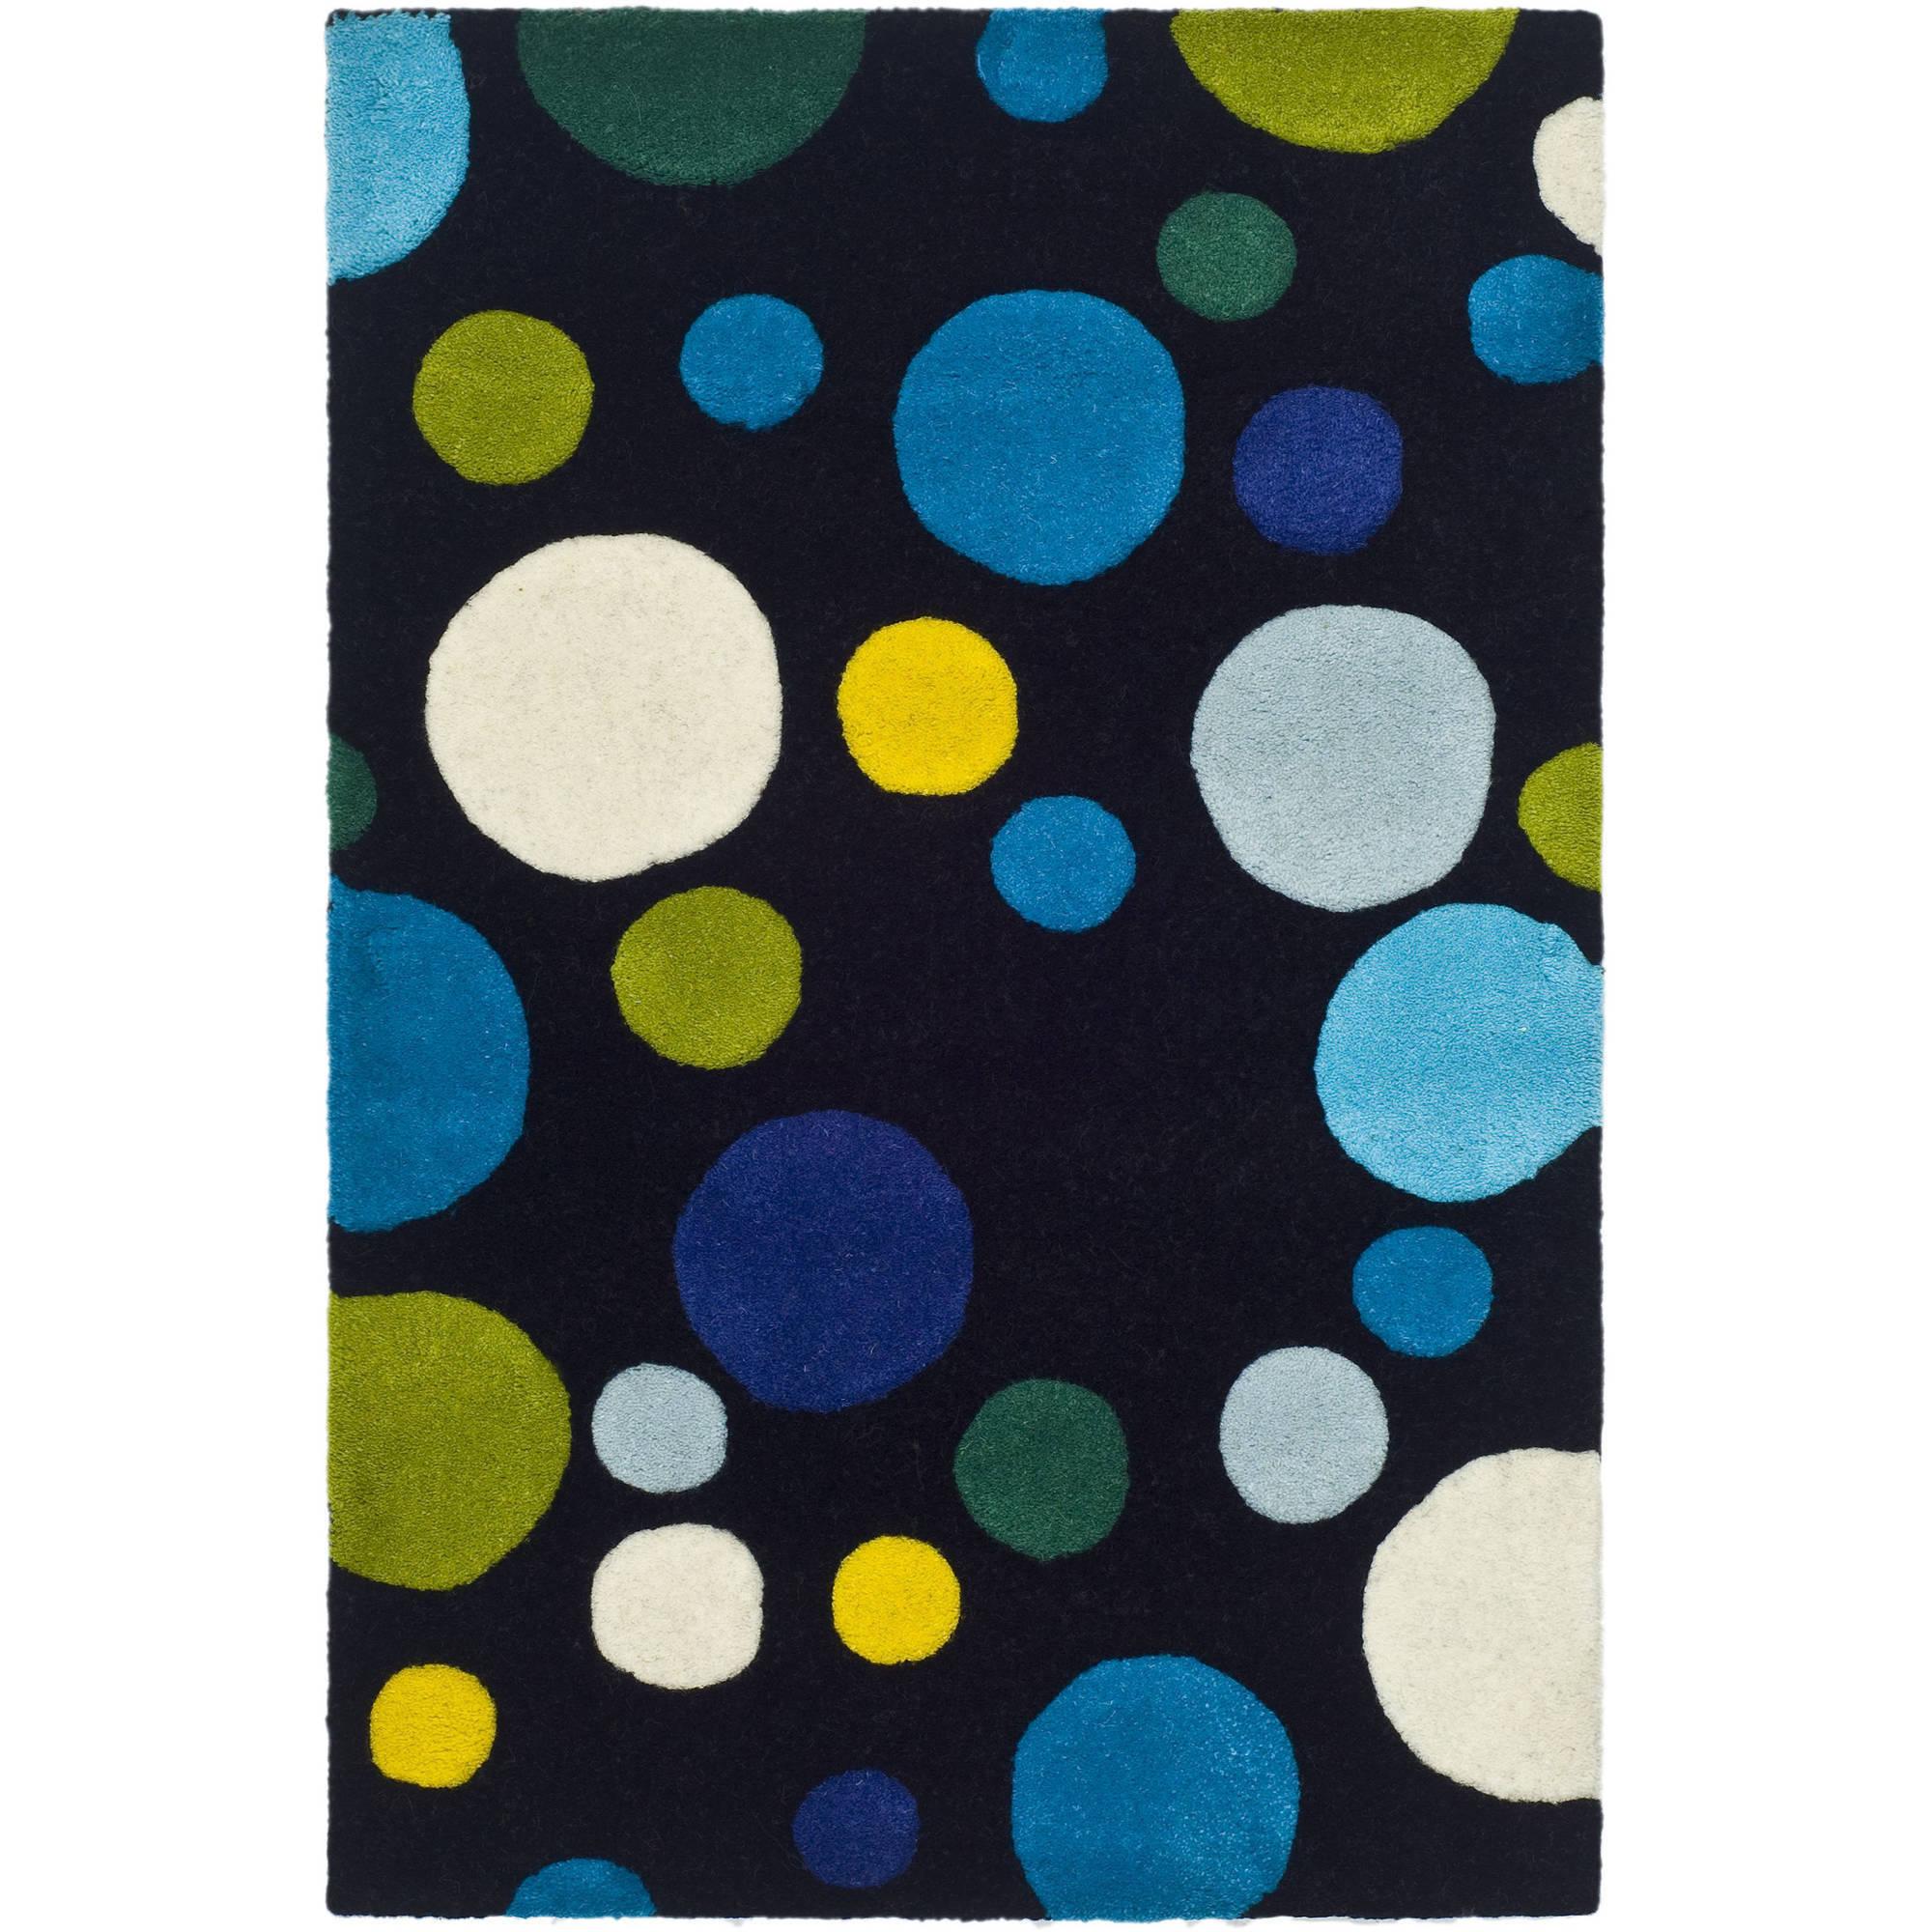 Safavieh Soho Dots Rug, Ivory, Blue and Green